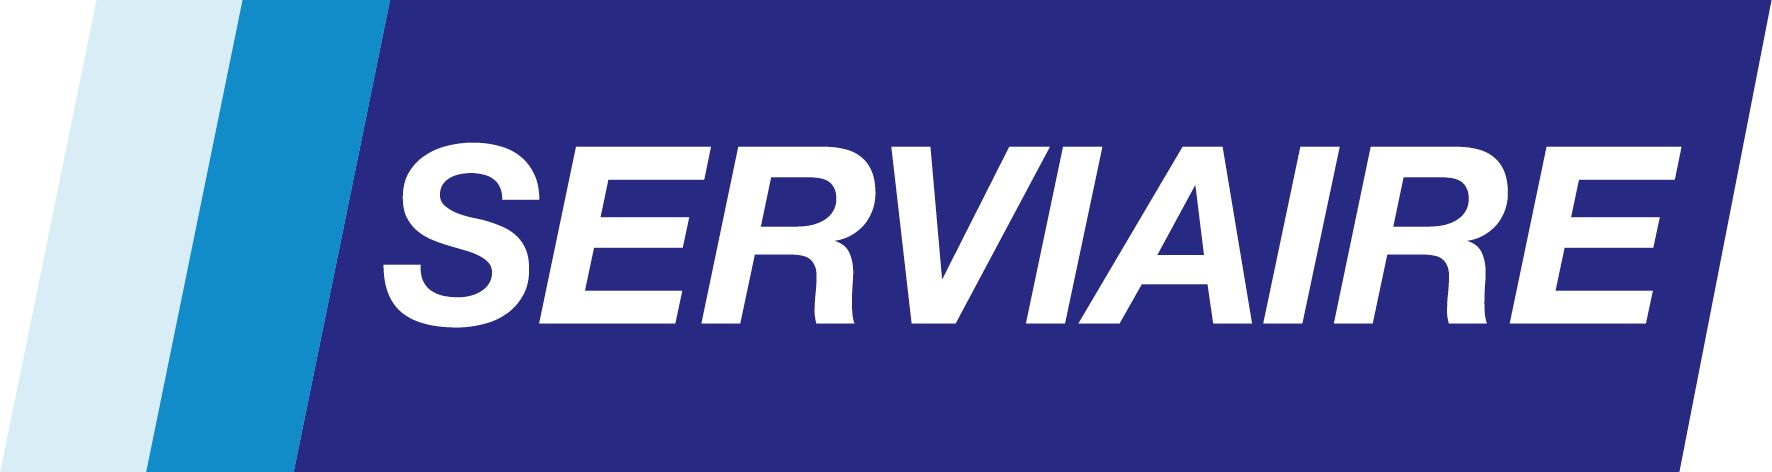 Serviaire